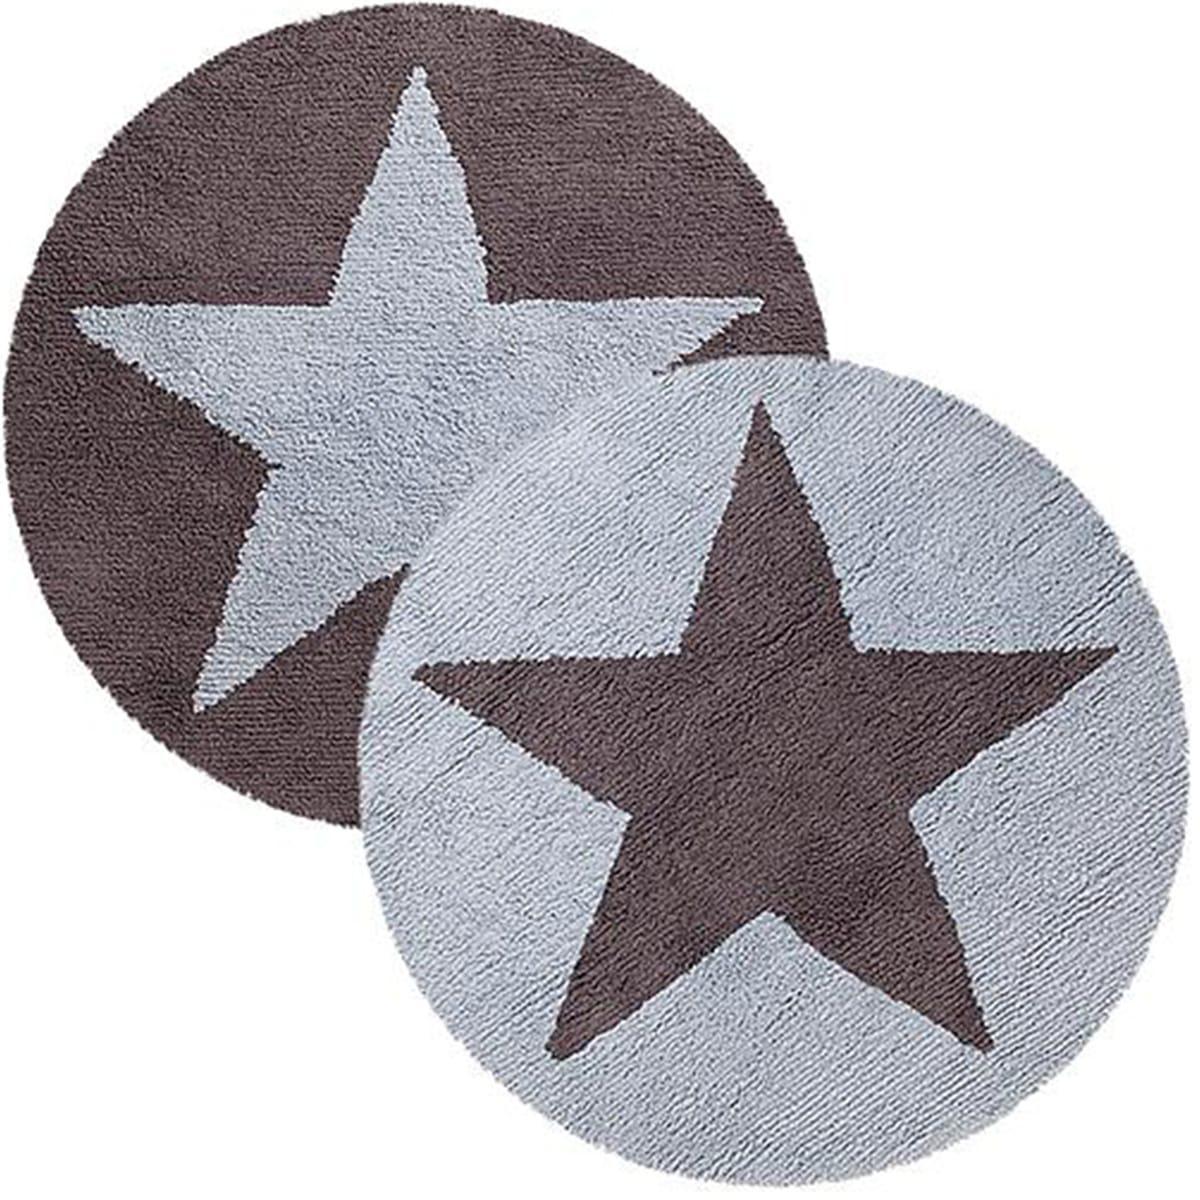 Alfombra redonda 140cm réversible STARS Lorena Canals blue-dark grey